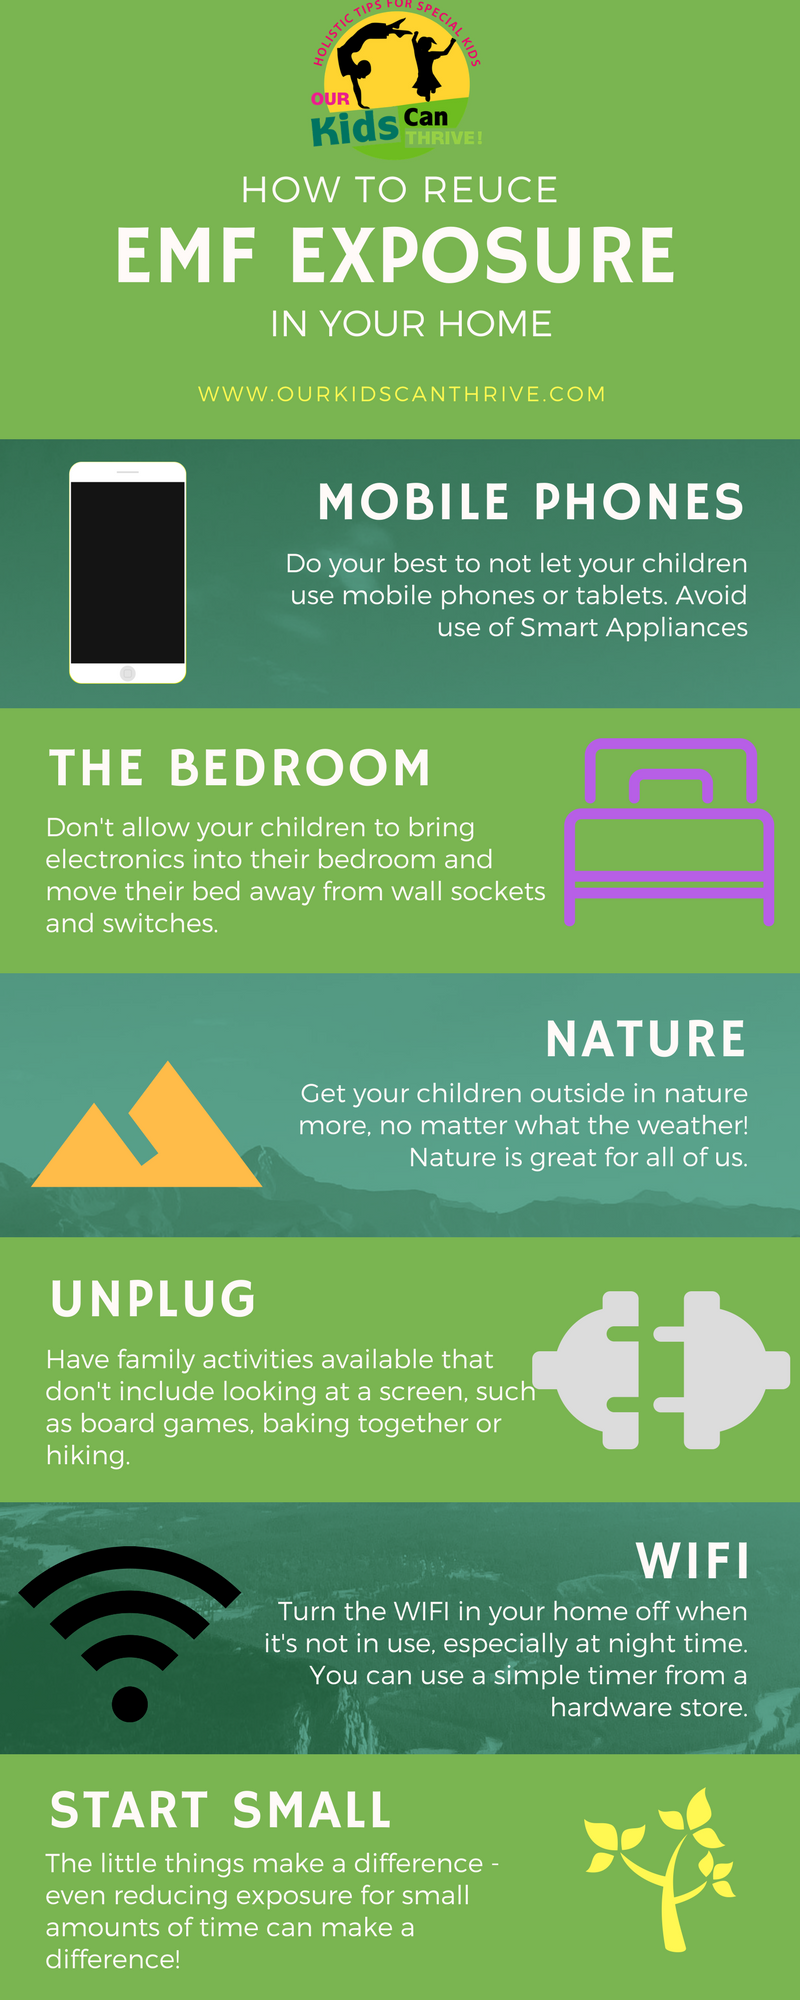 emf infographic